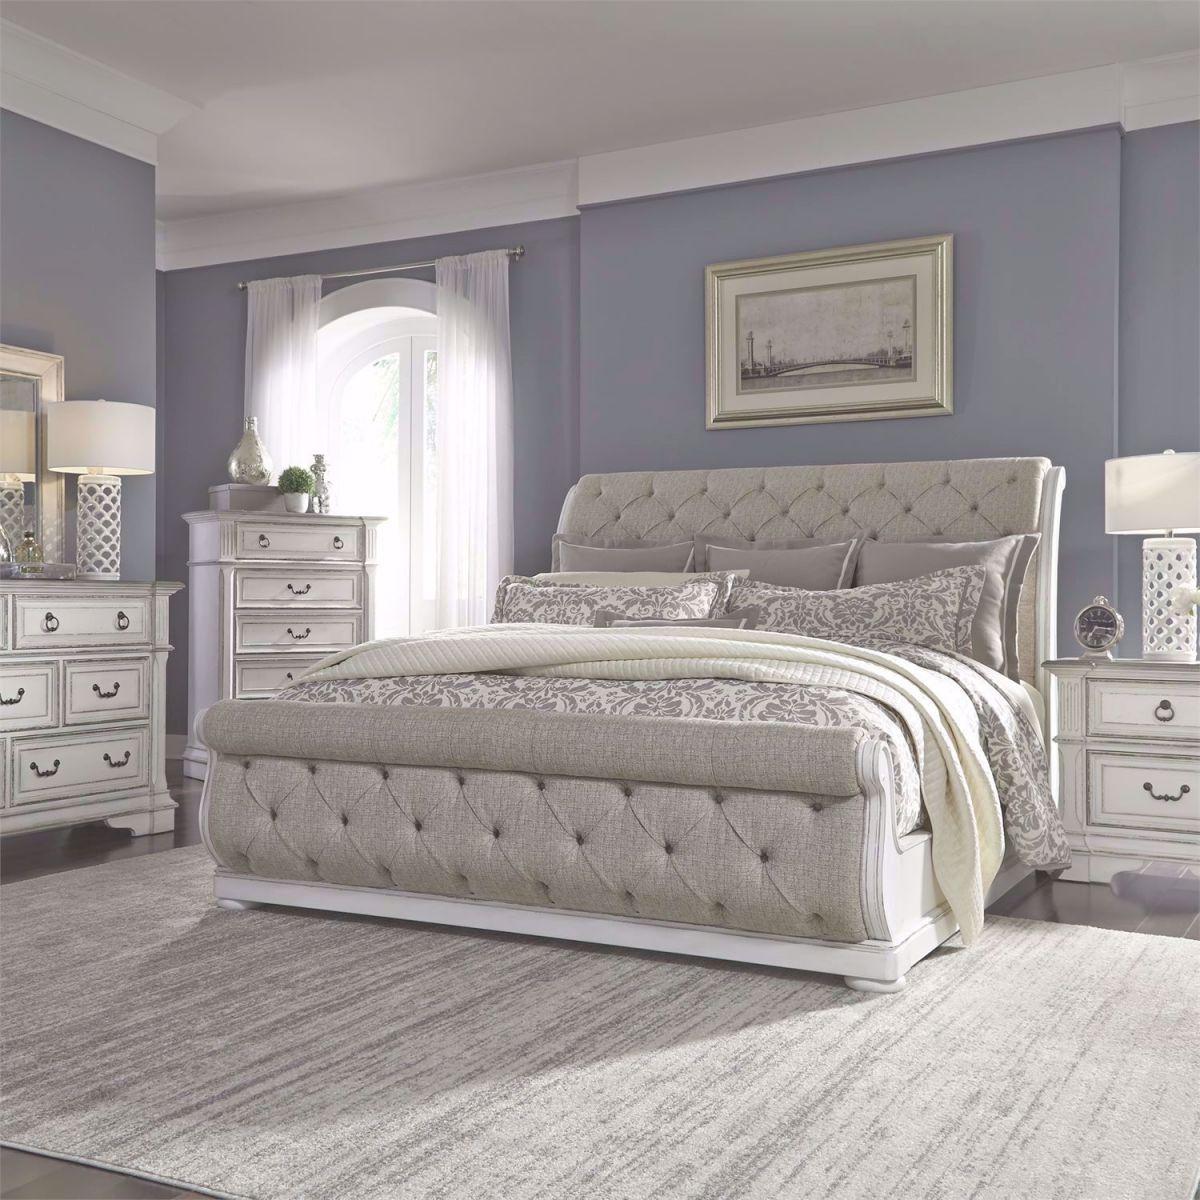 Sturbridge King Bedroom Set for Luxury Bedroom Sets King